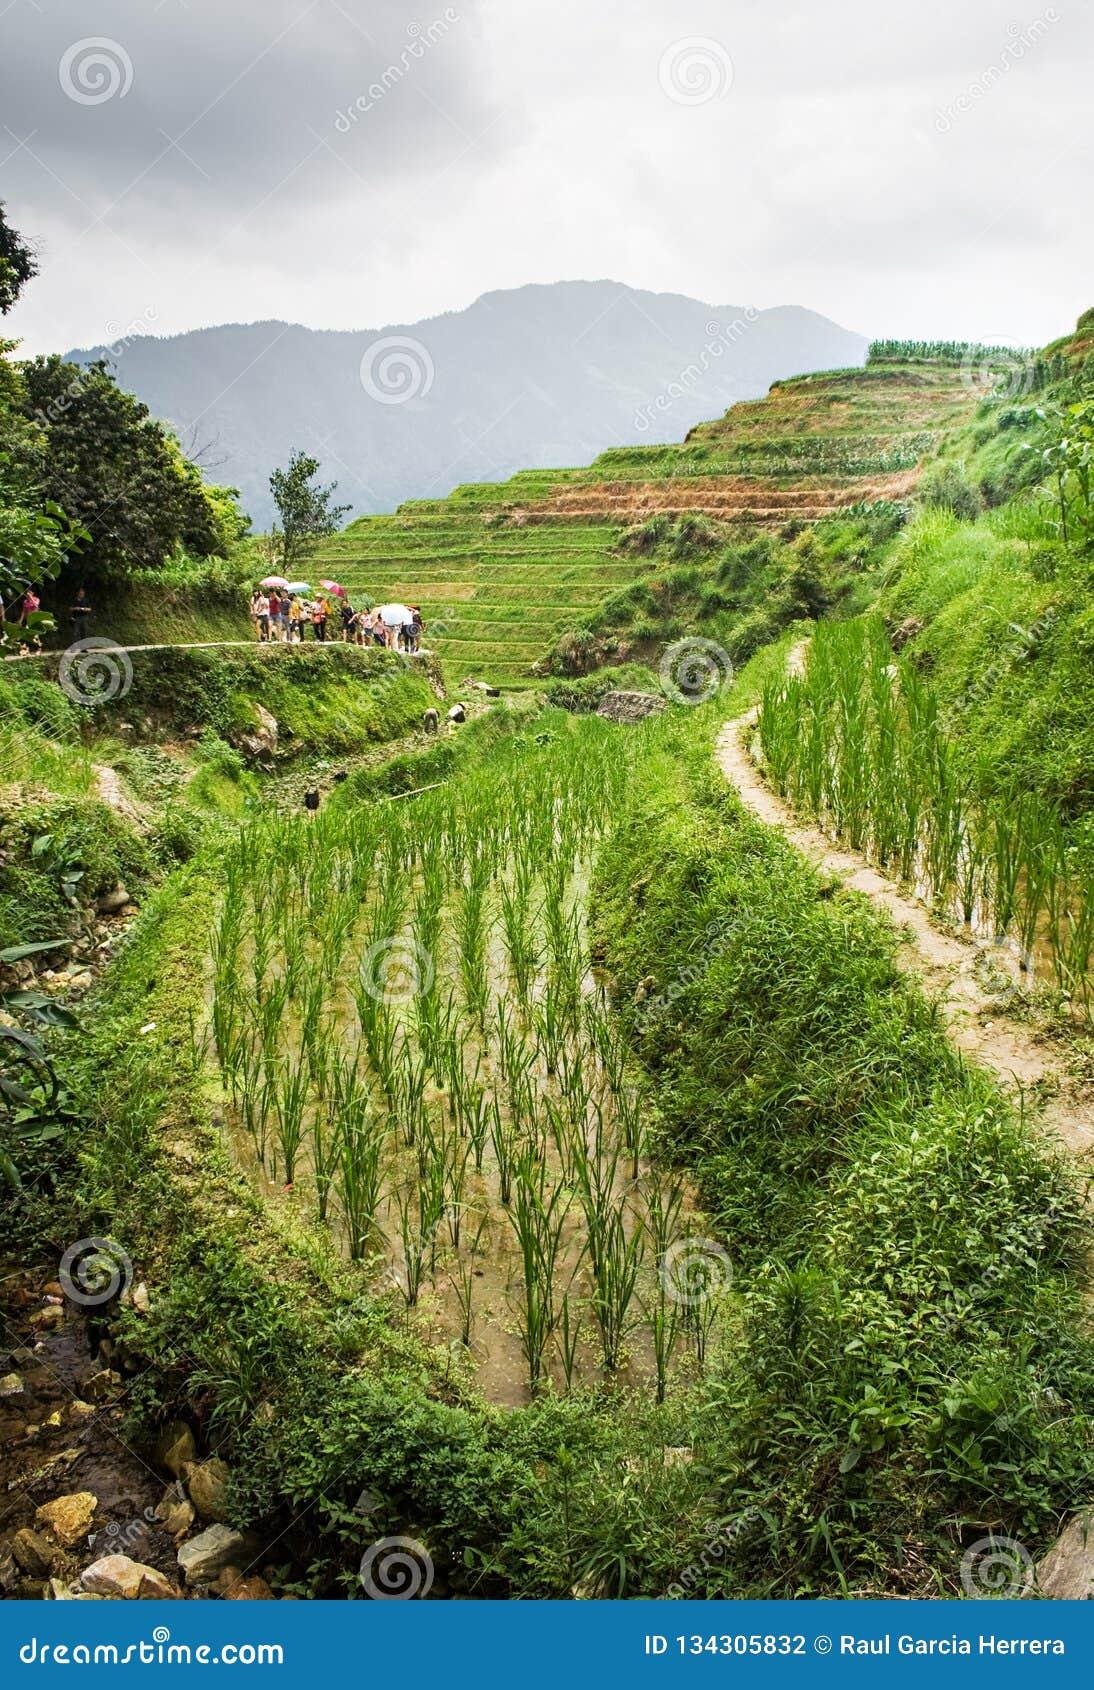 Kinesisk plats i de härliga terrasserade risfälten i Longsheng Tian Tou Zhai by i longjiristerrass i guangxi Kina